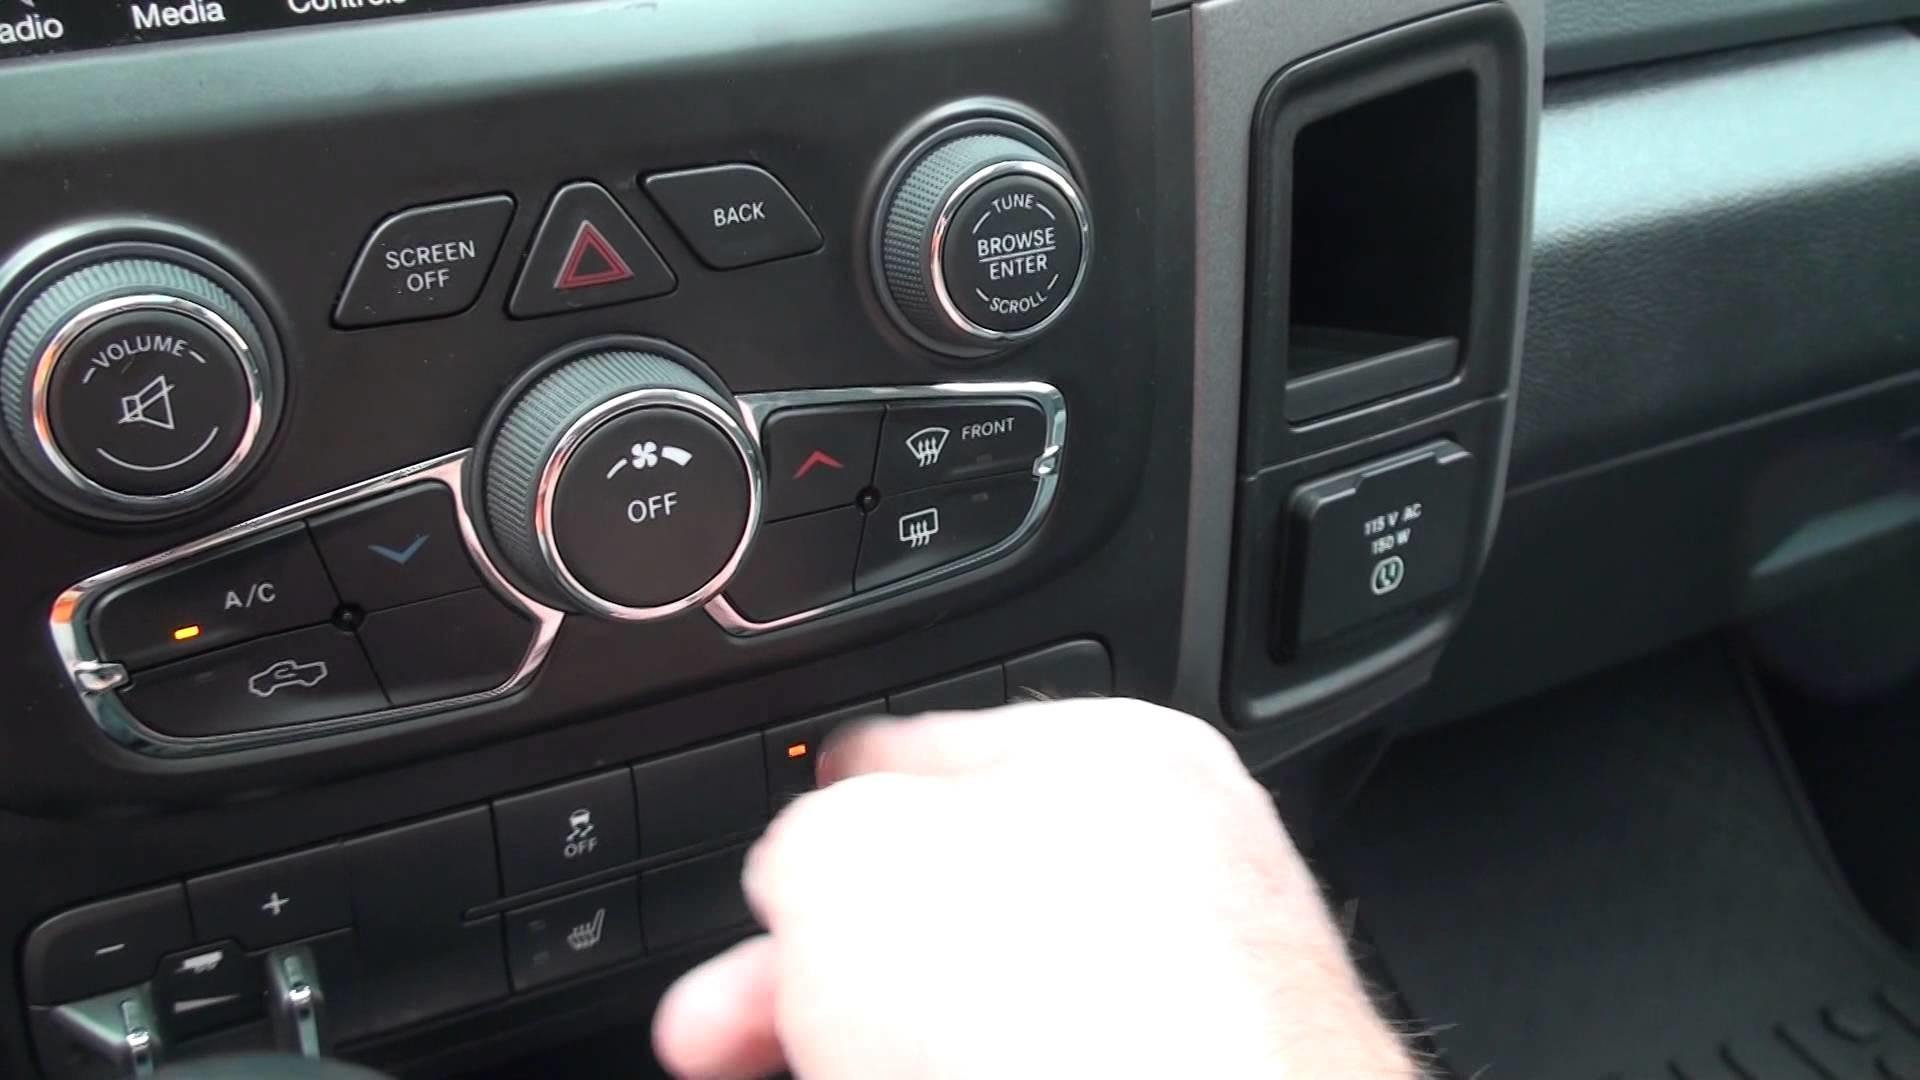 HD VIDEO 2014 DODGE RAM 3500 BIG HORN SLT 4X4 CUMMINS DIESEL FOR SALE ANGEL  GREEN SEE WWW SUNSETMOTO